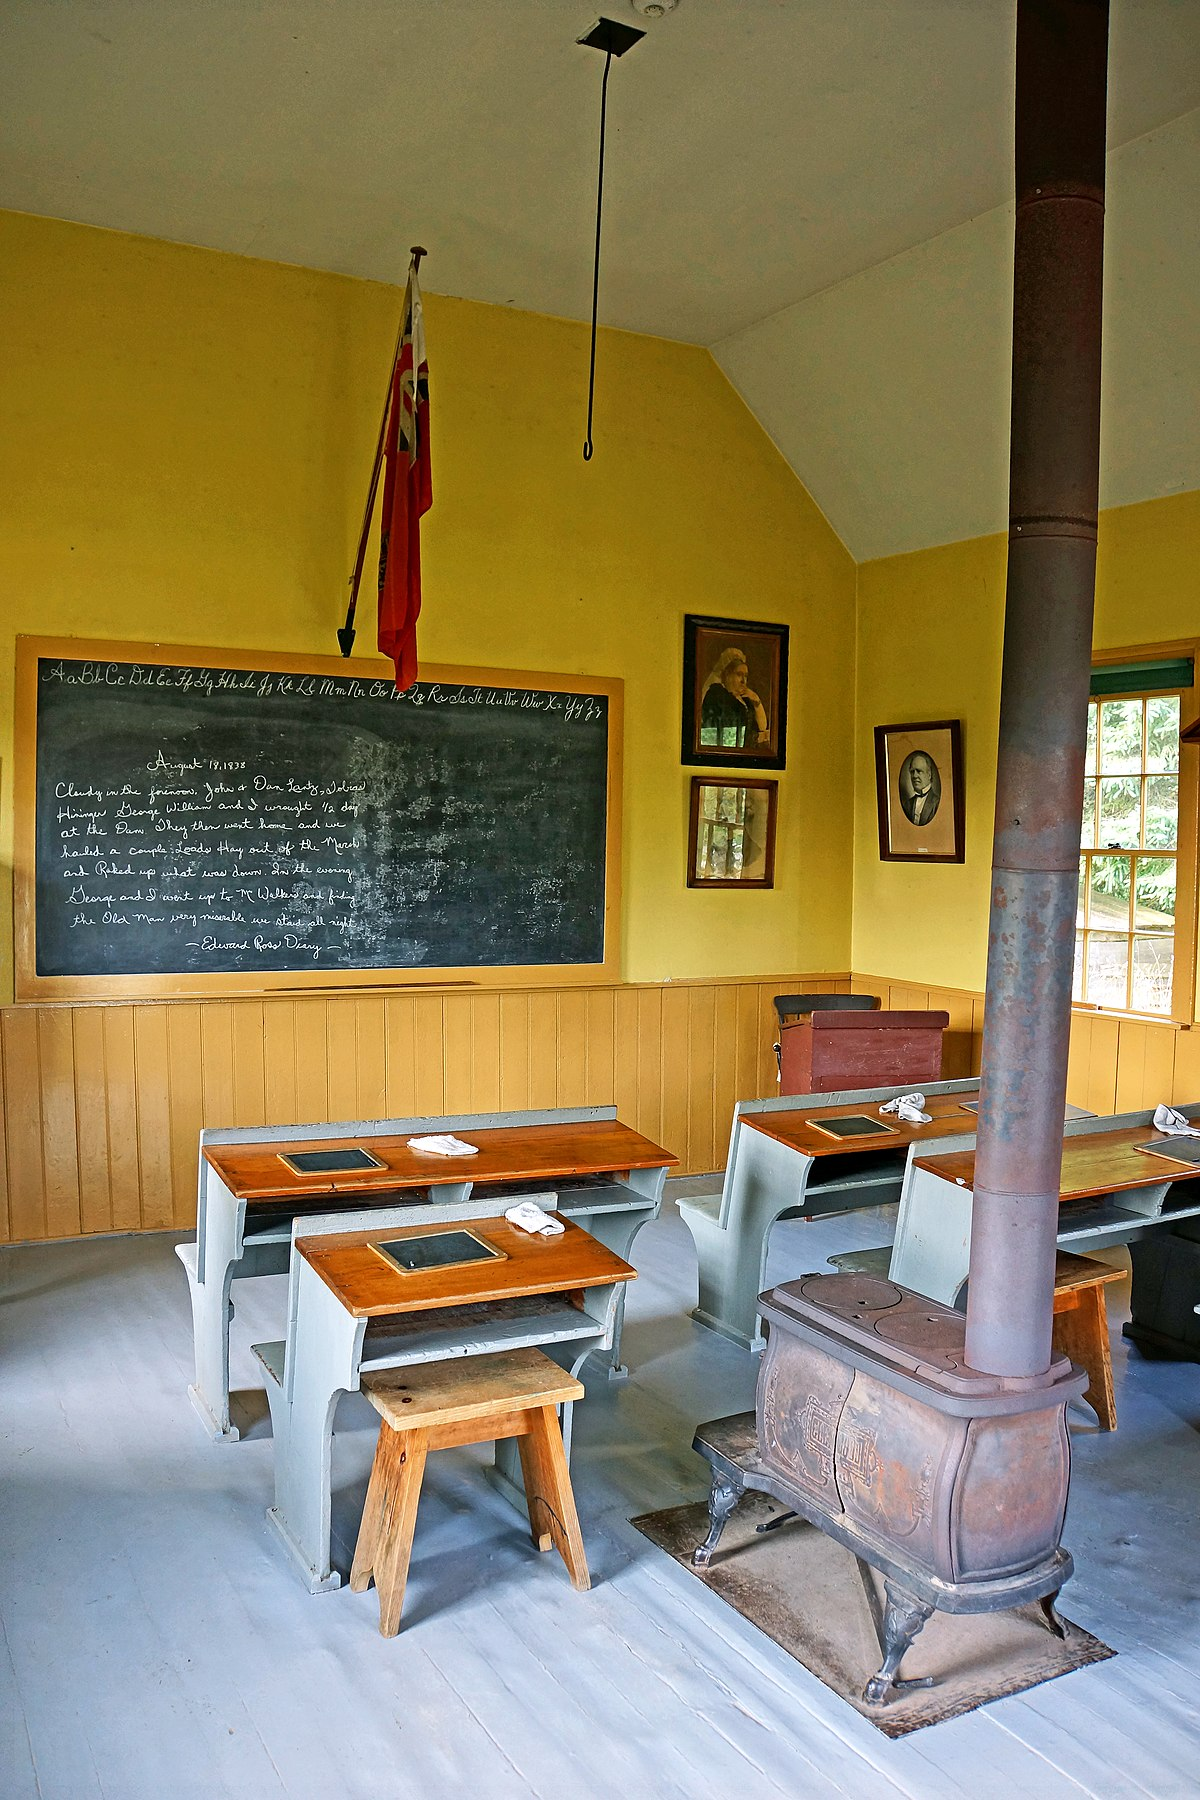 File Nova Scotia Dsc01425 One Room School House 7815239390 Jpg Wikimedia Commons